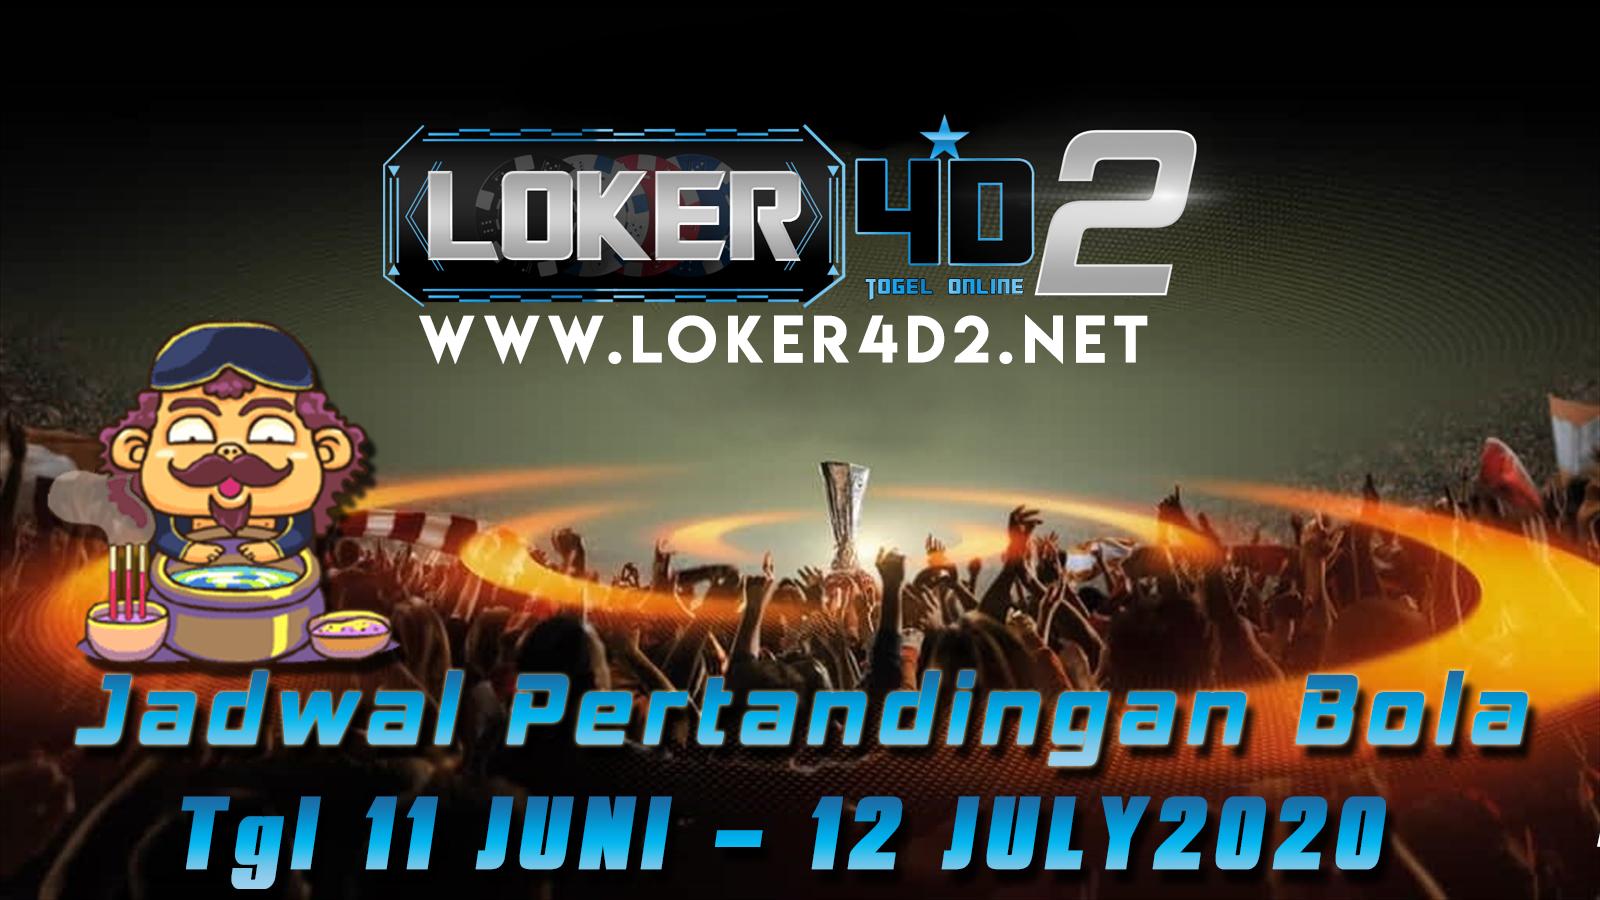 JADWAL PERTANDINGAN BOLA 11-12 JULI 2020